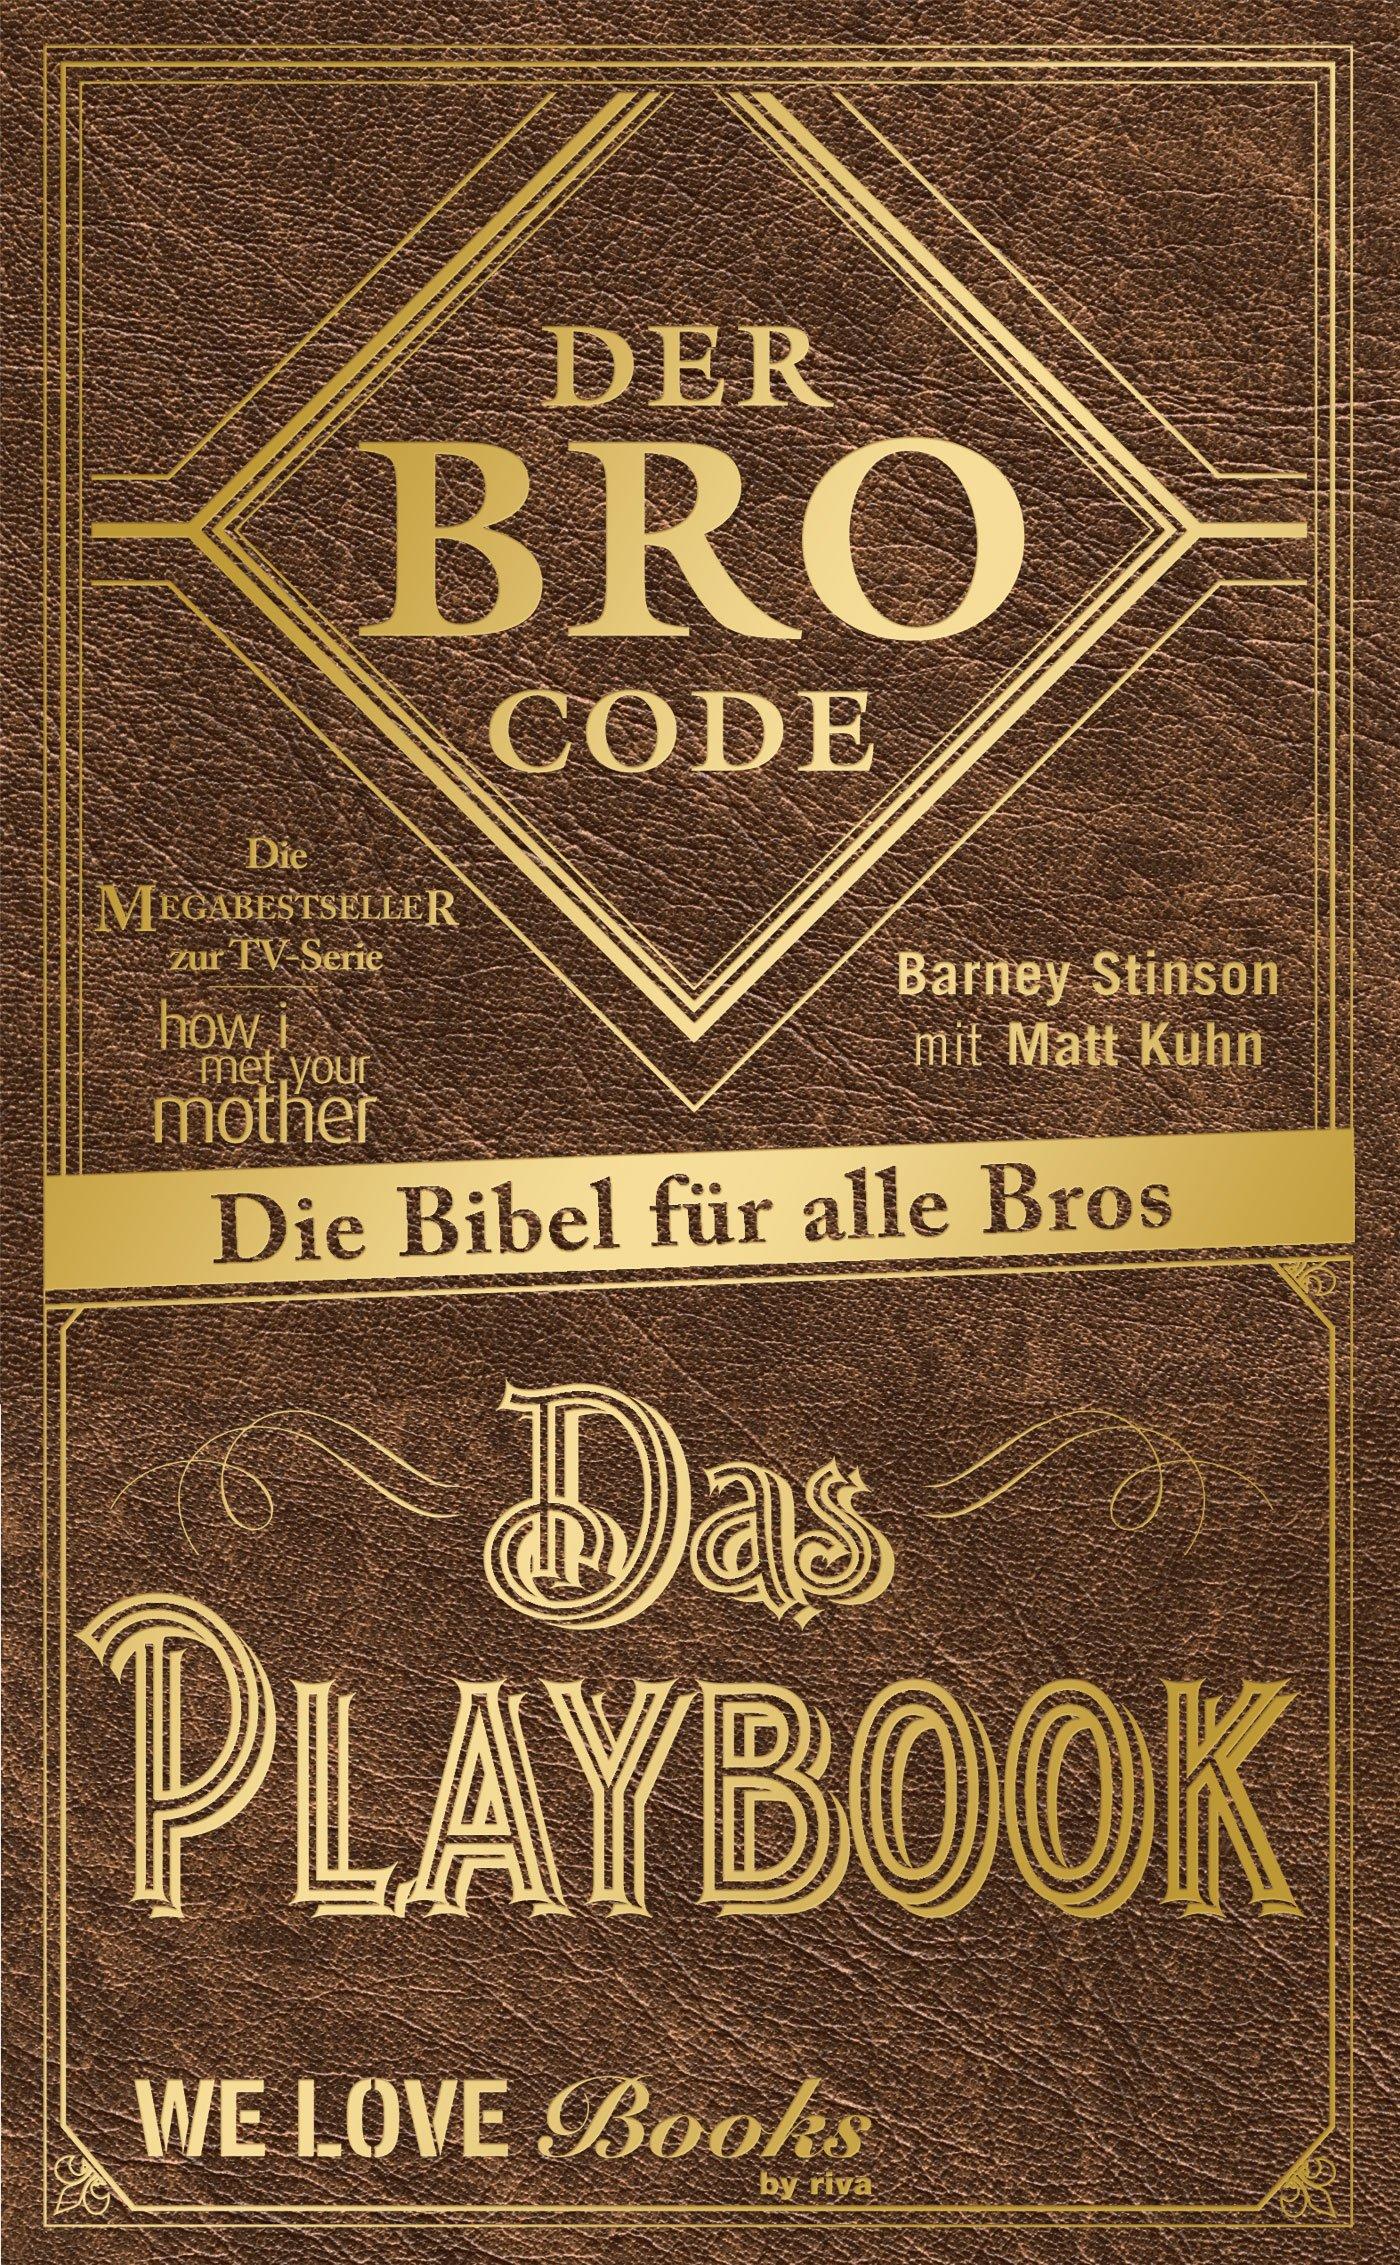 Der Bro Code: Das Buch zur TV-Serie how i met your mother (German Edition)